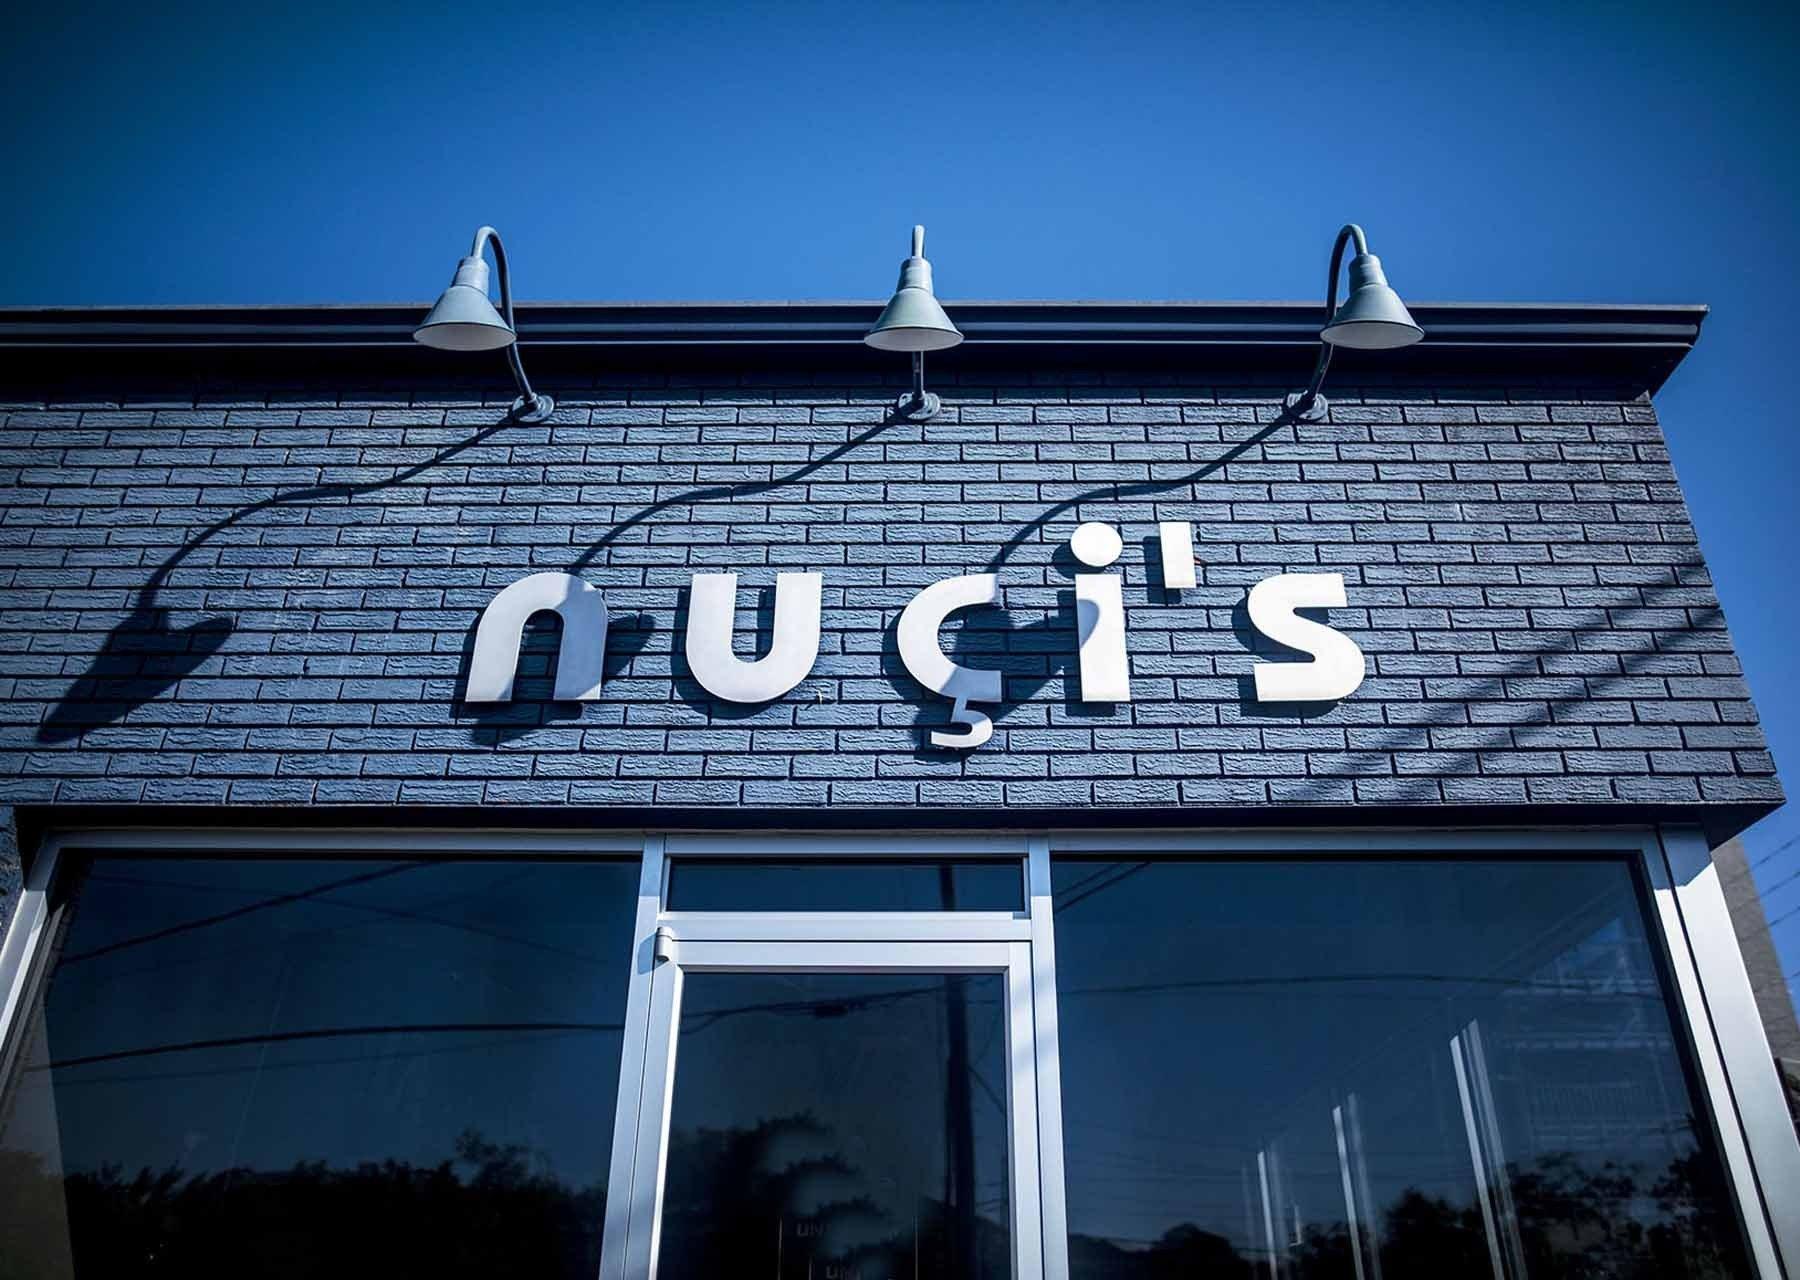 Nuci's Space Building